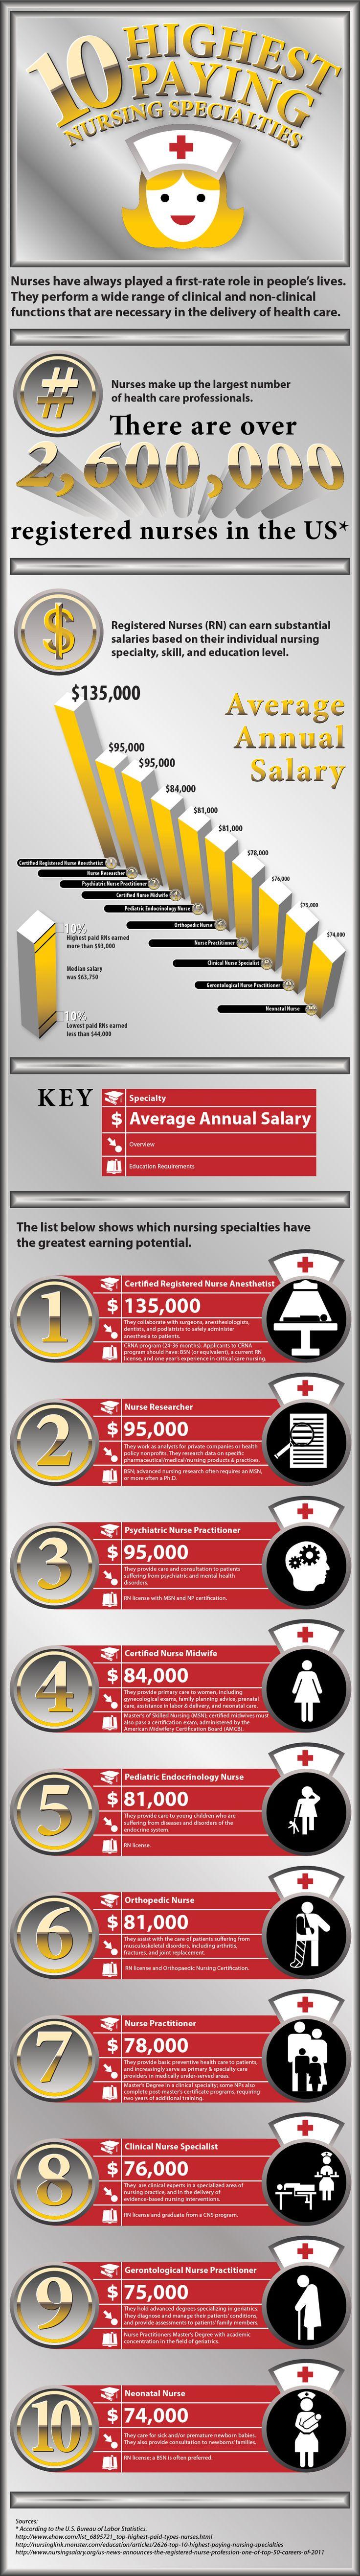 Top 10 Paying Nursing Specialties